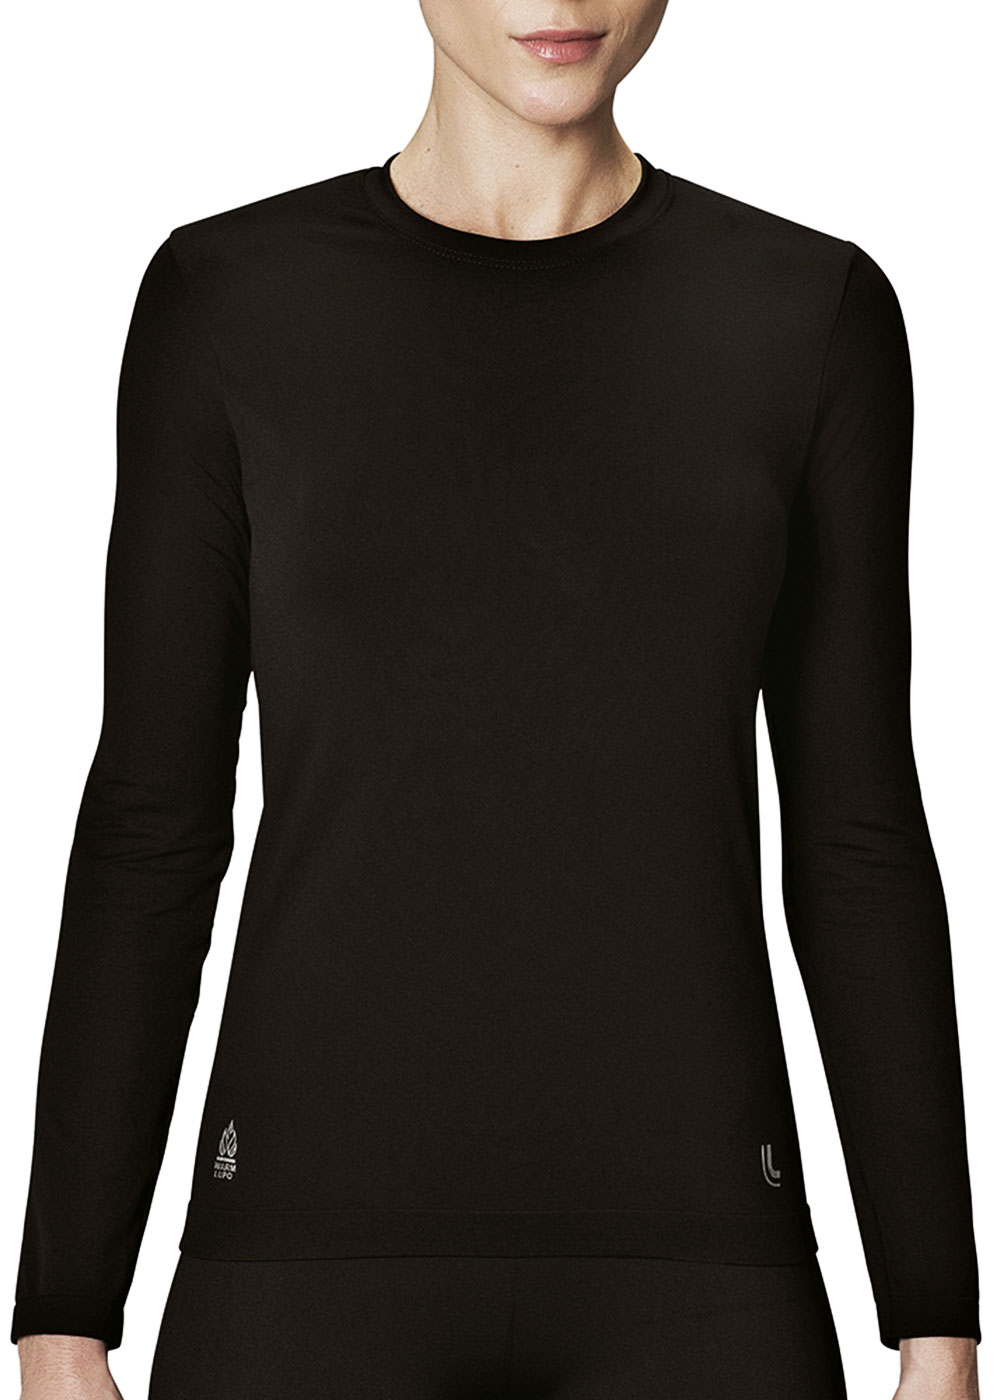 Blusa Feminina Térmica Lupo Advanced Sem Costura Preta - Lupo